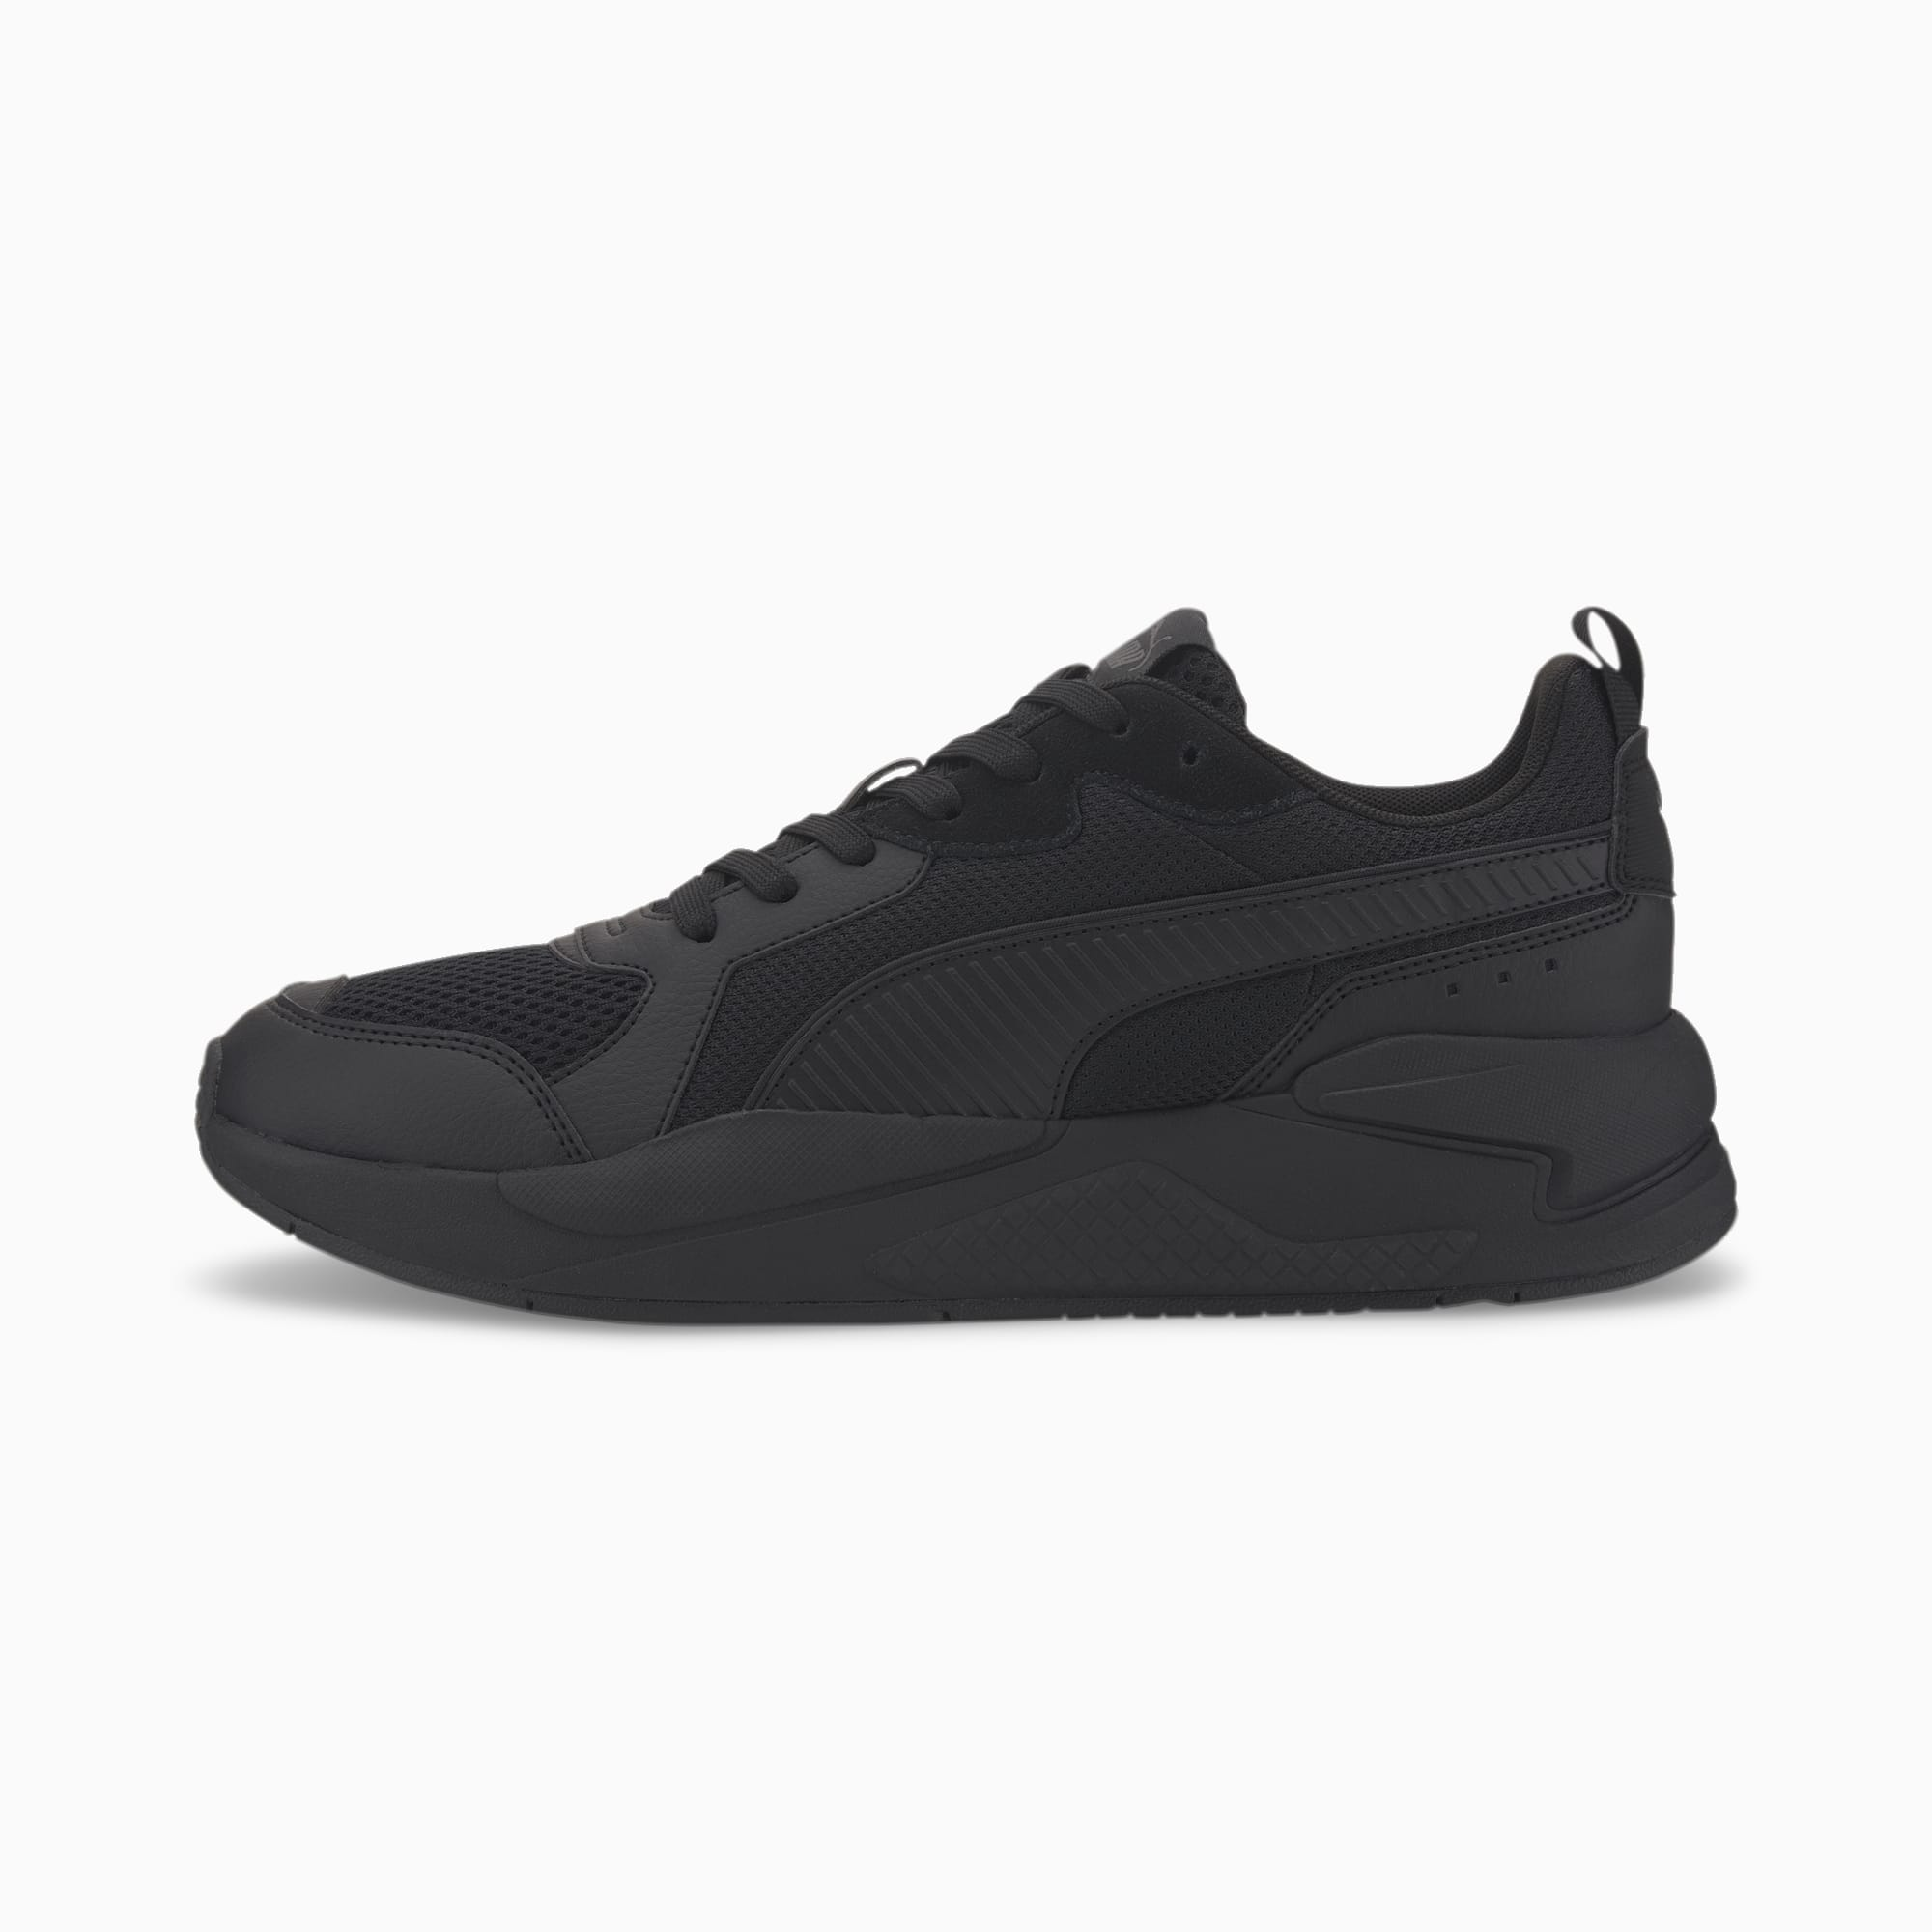 X-RAY Men's Sneakers